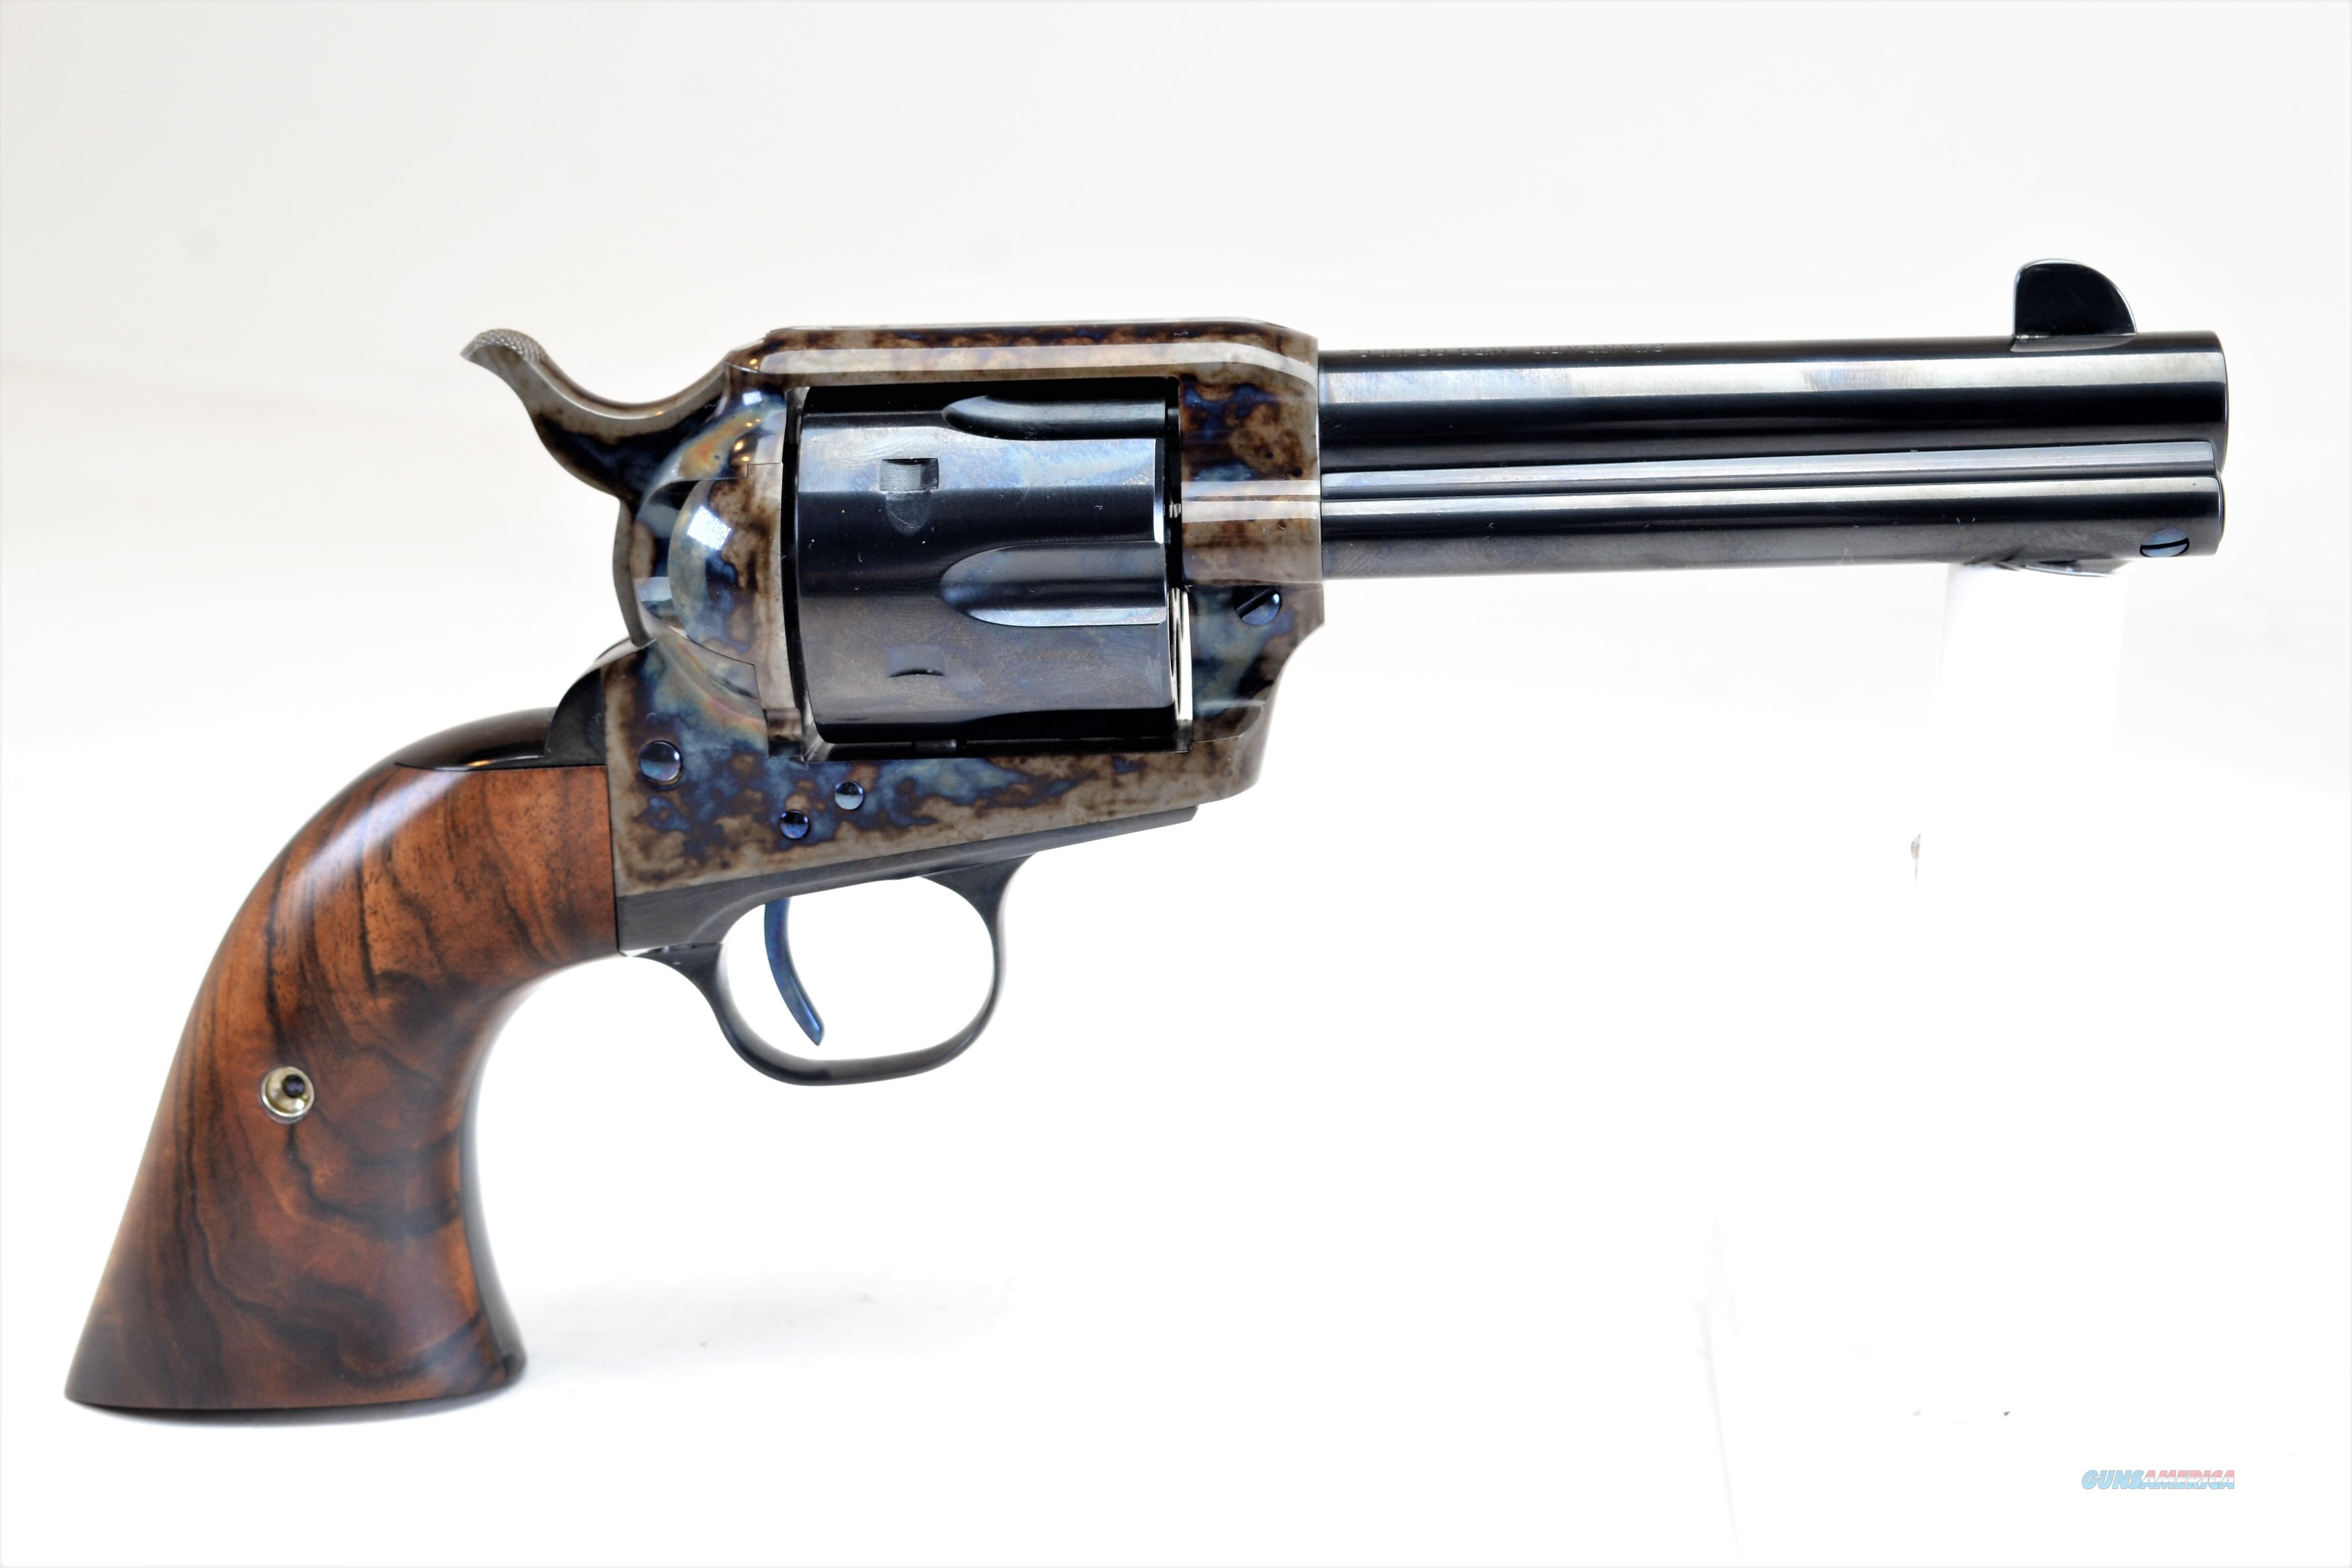 "Standard Manufacturing SA Revolver : Barrel Lengths: 4 ¾"", 5 ½"", 7 ½""  #SA1  Guns > Pistols > Colt Replica (American) Pistols"